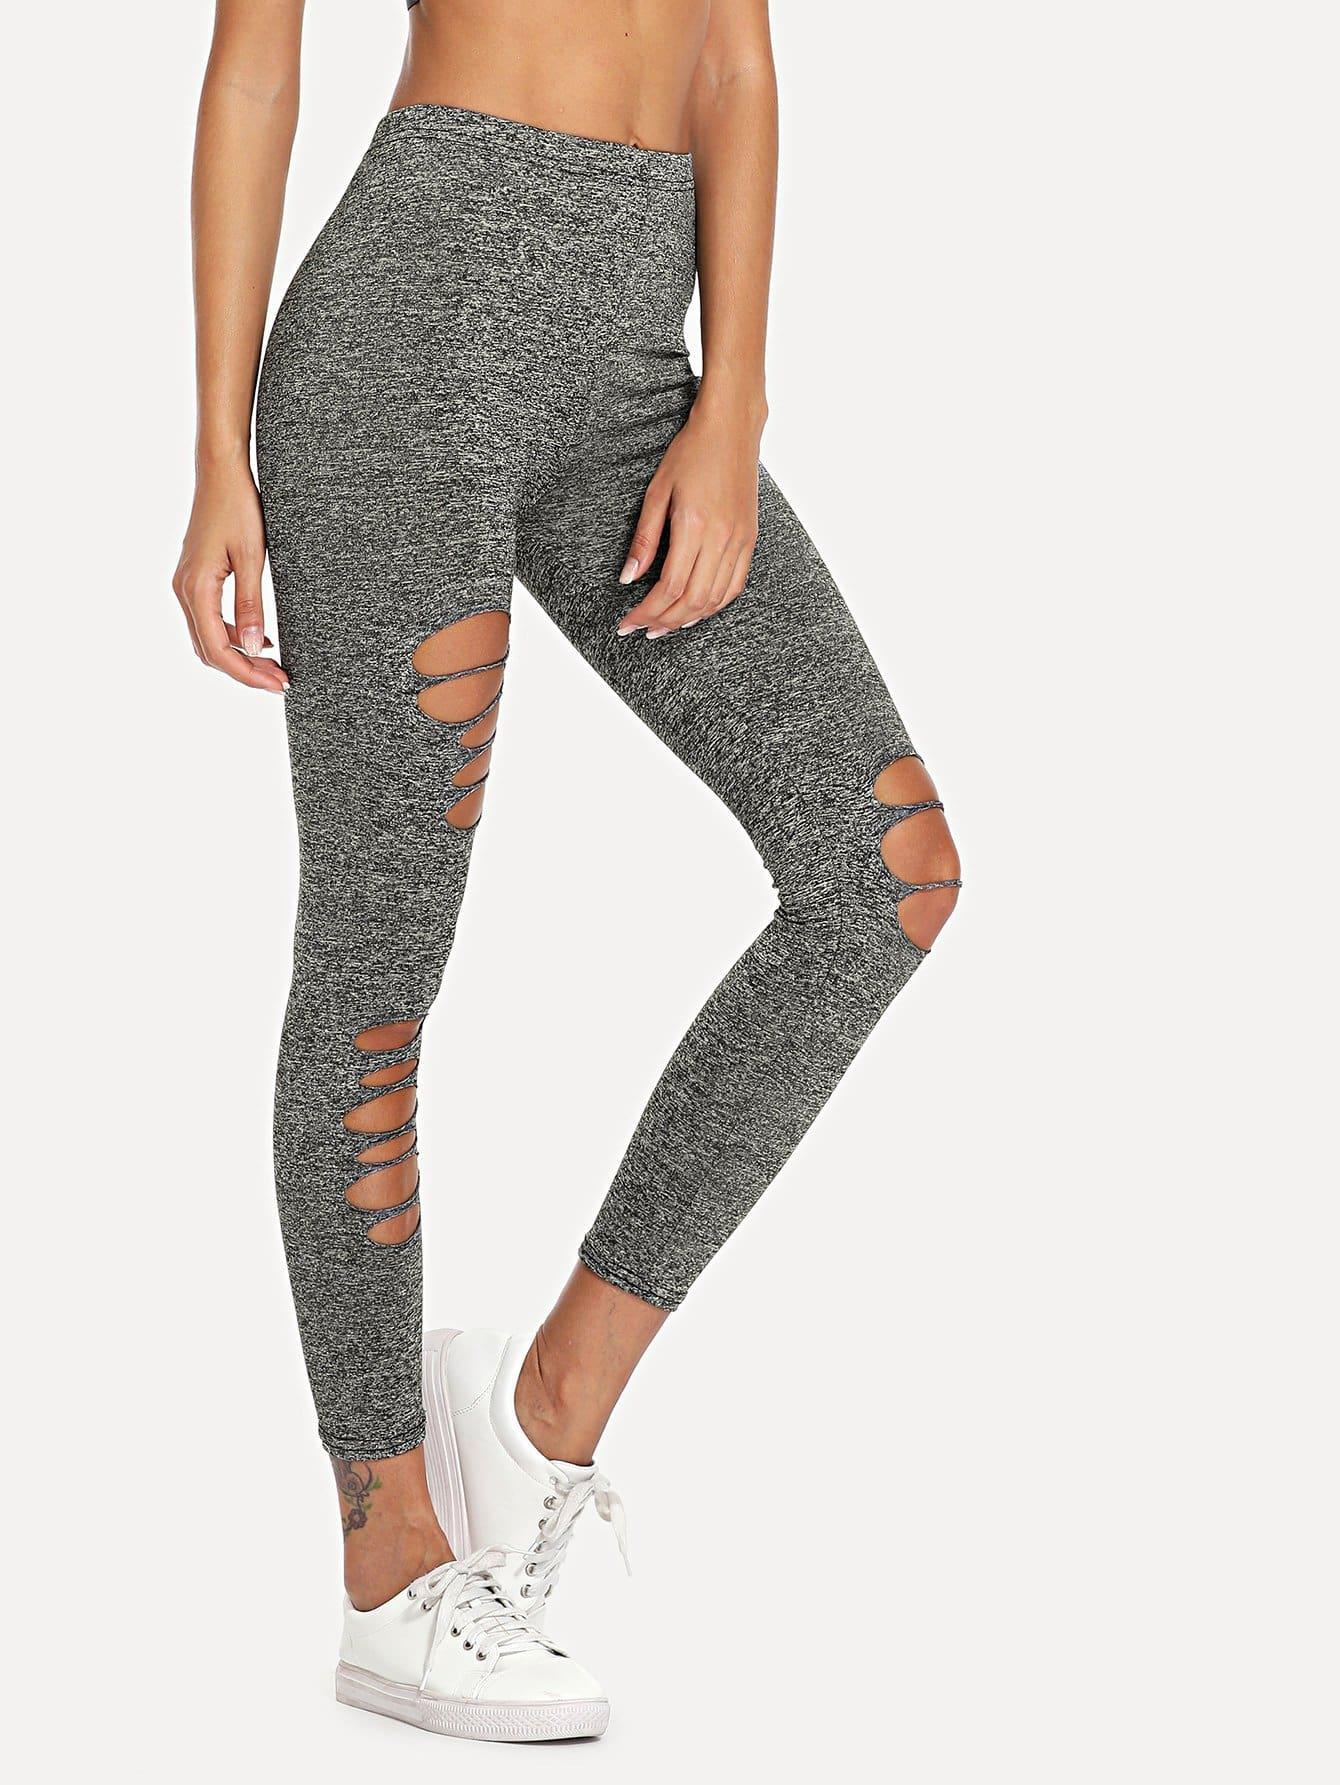 Asymmetrical Ripped Leggings black slim ripped leggings